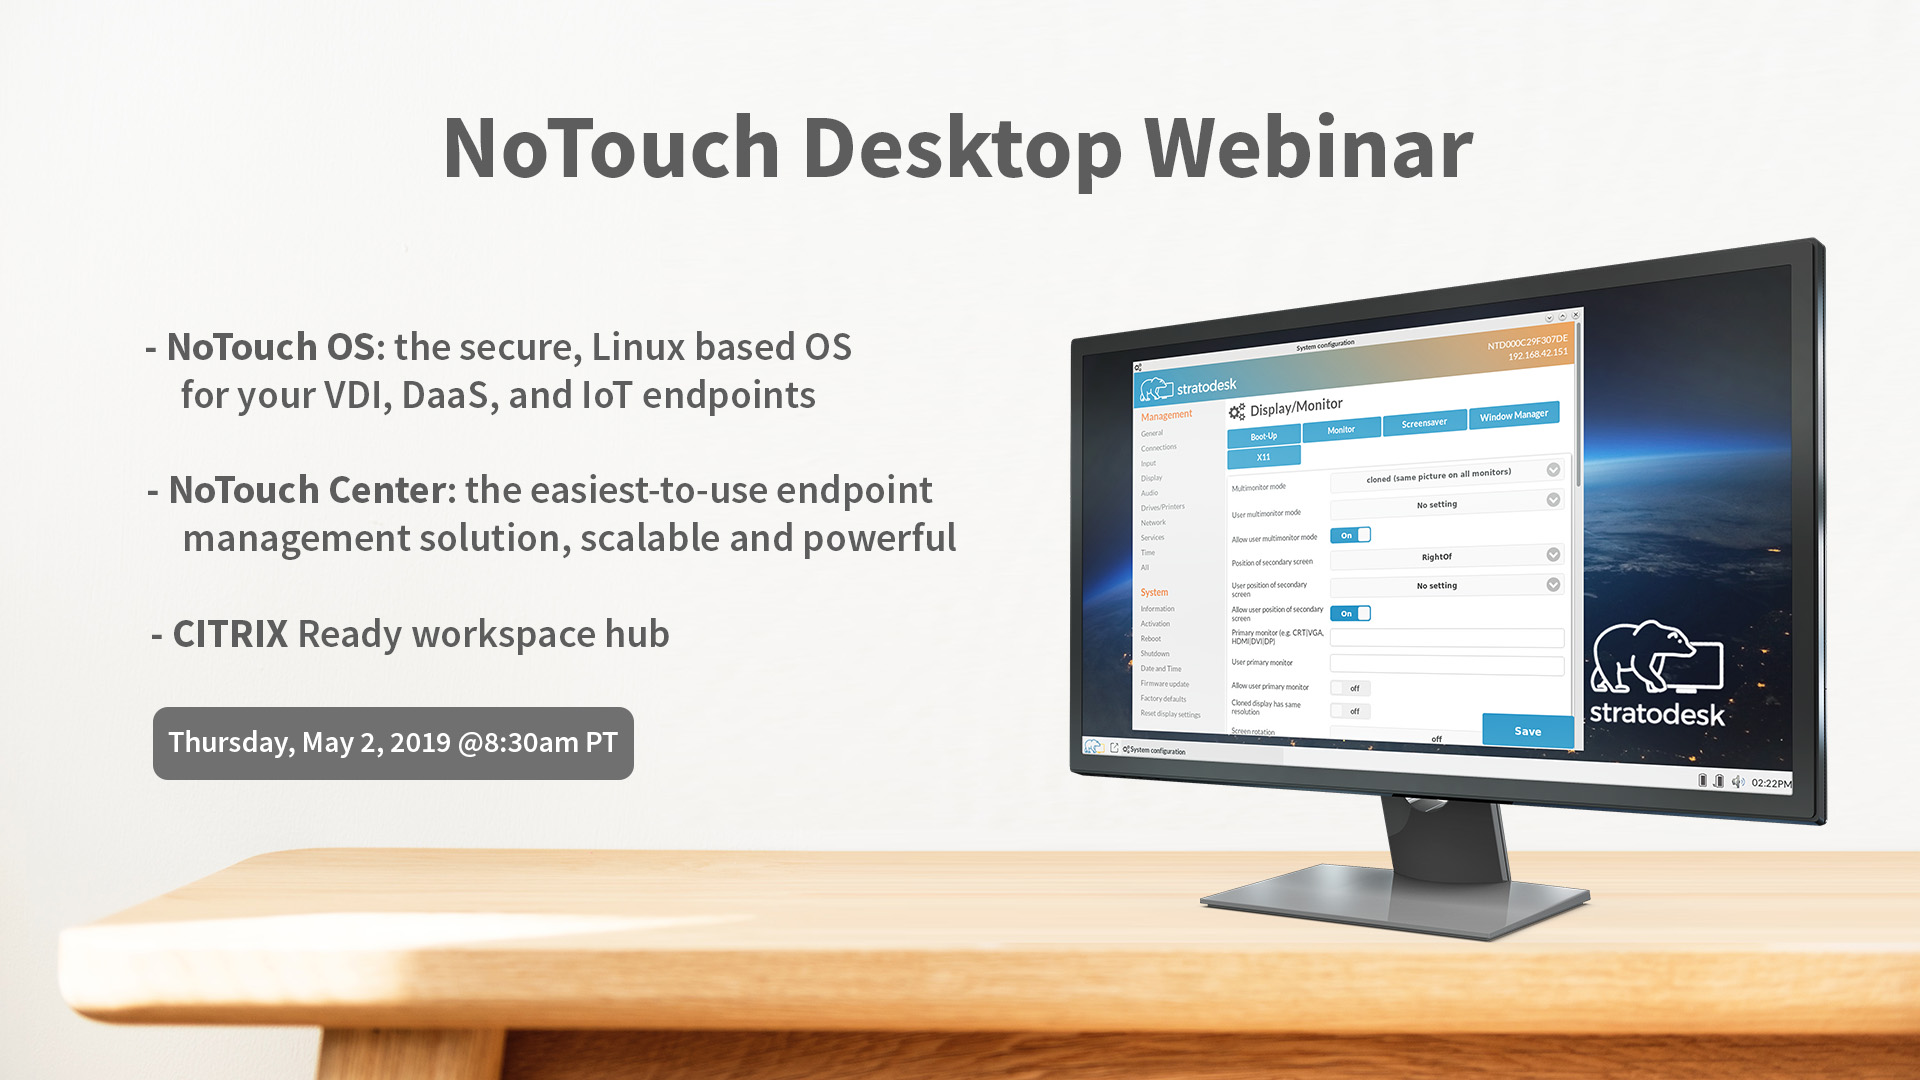 notouch dekstop webinar may updated (1)